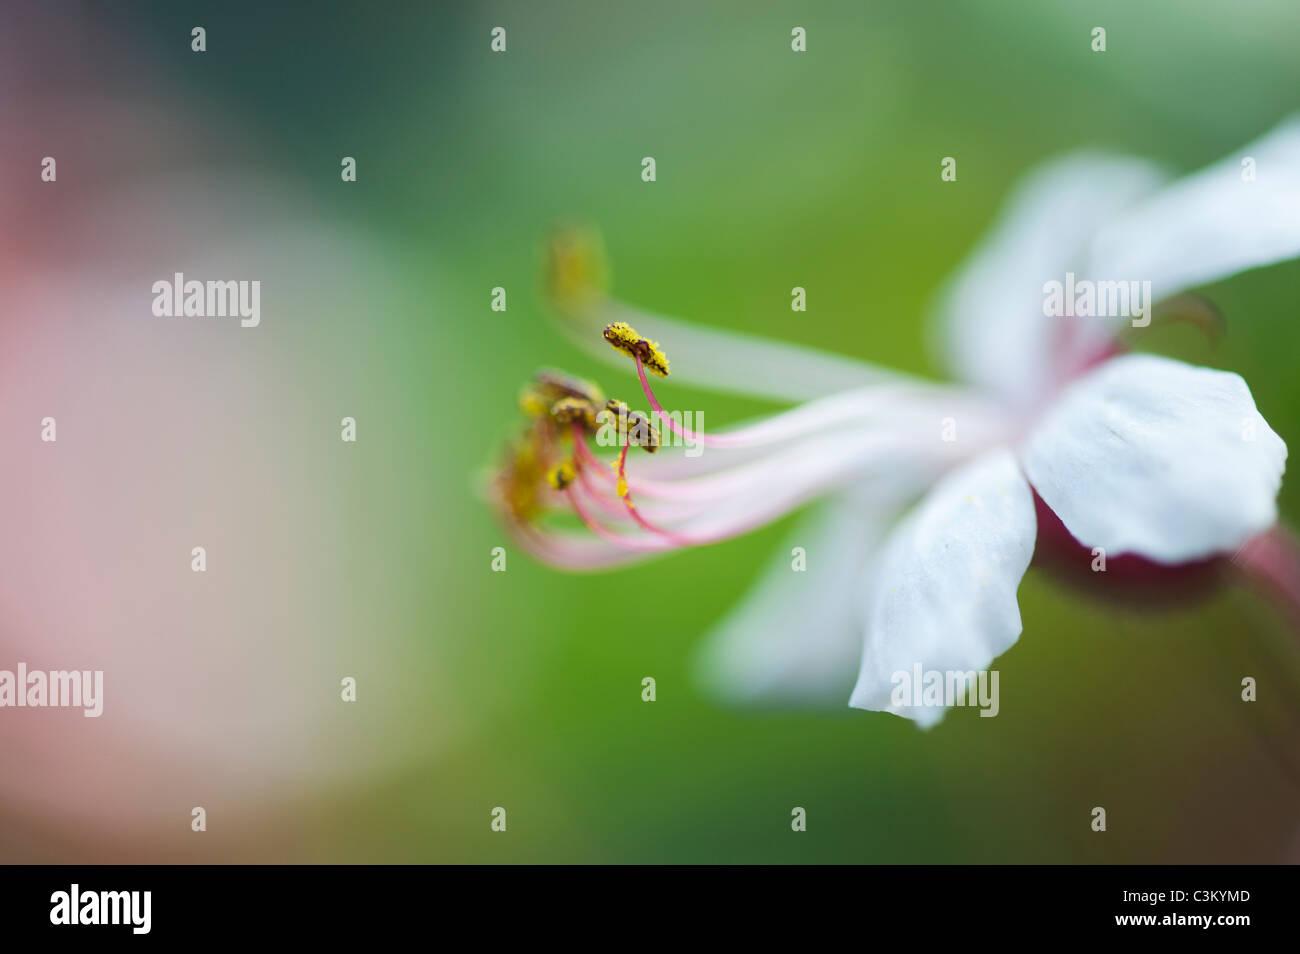 Geranium macrorrhizum 'Album' flower. Rock cranesbill. Close up on anthers and pollen - Stock Image